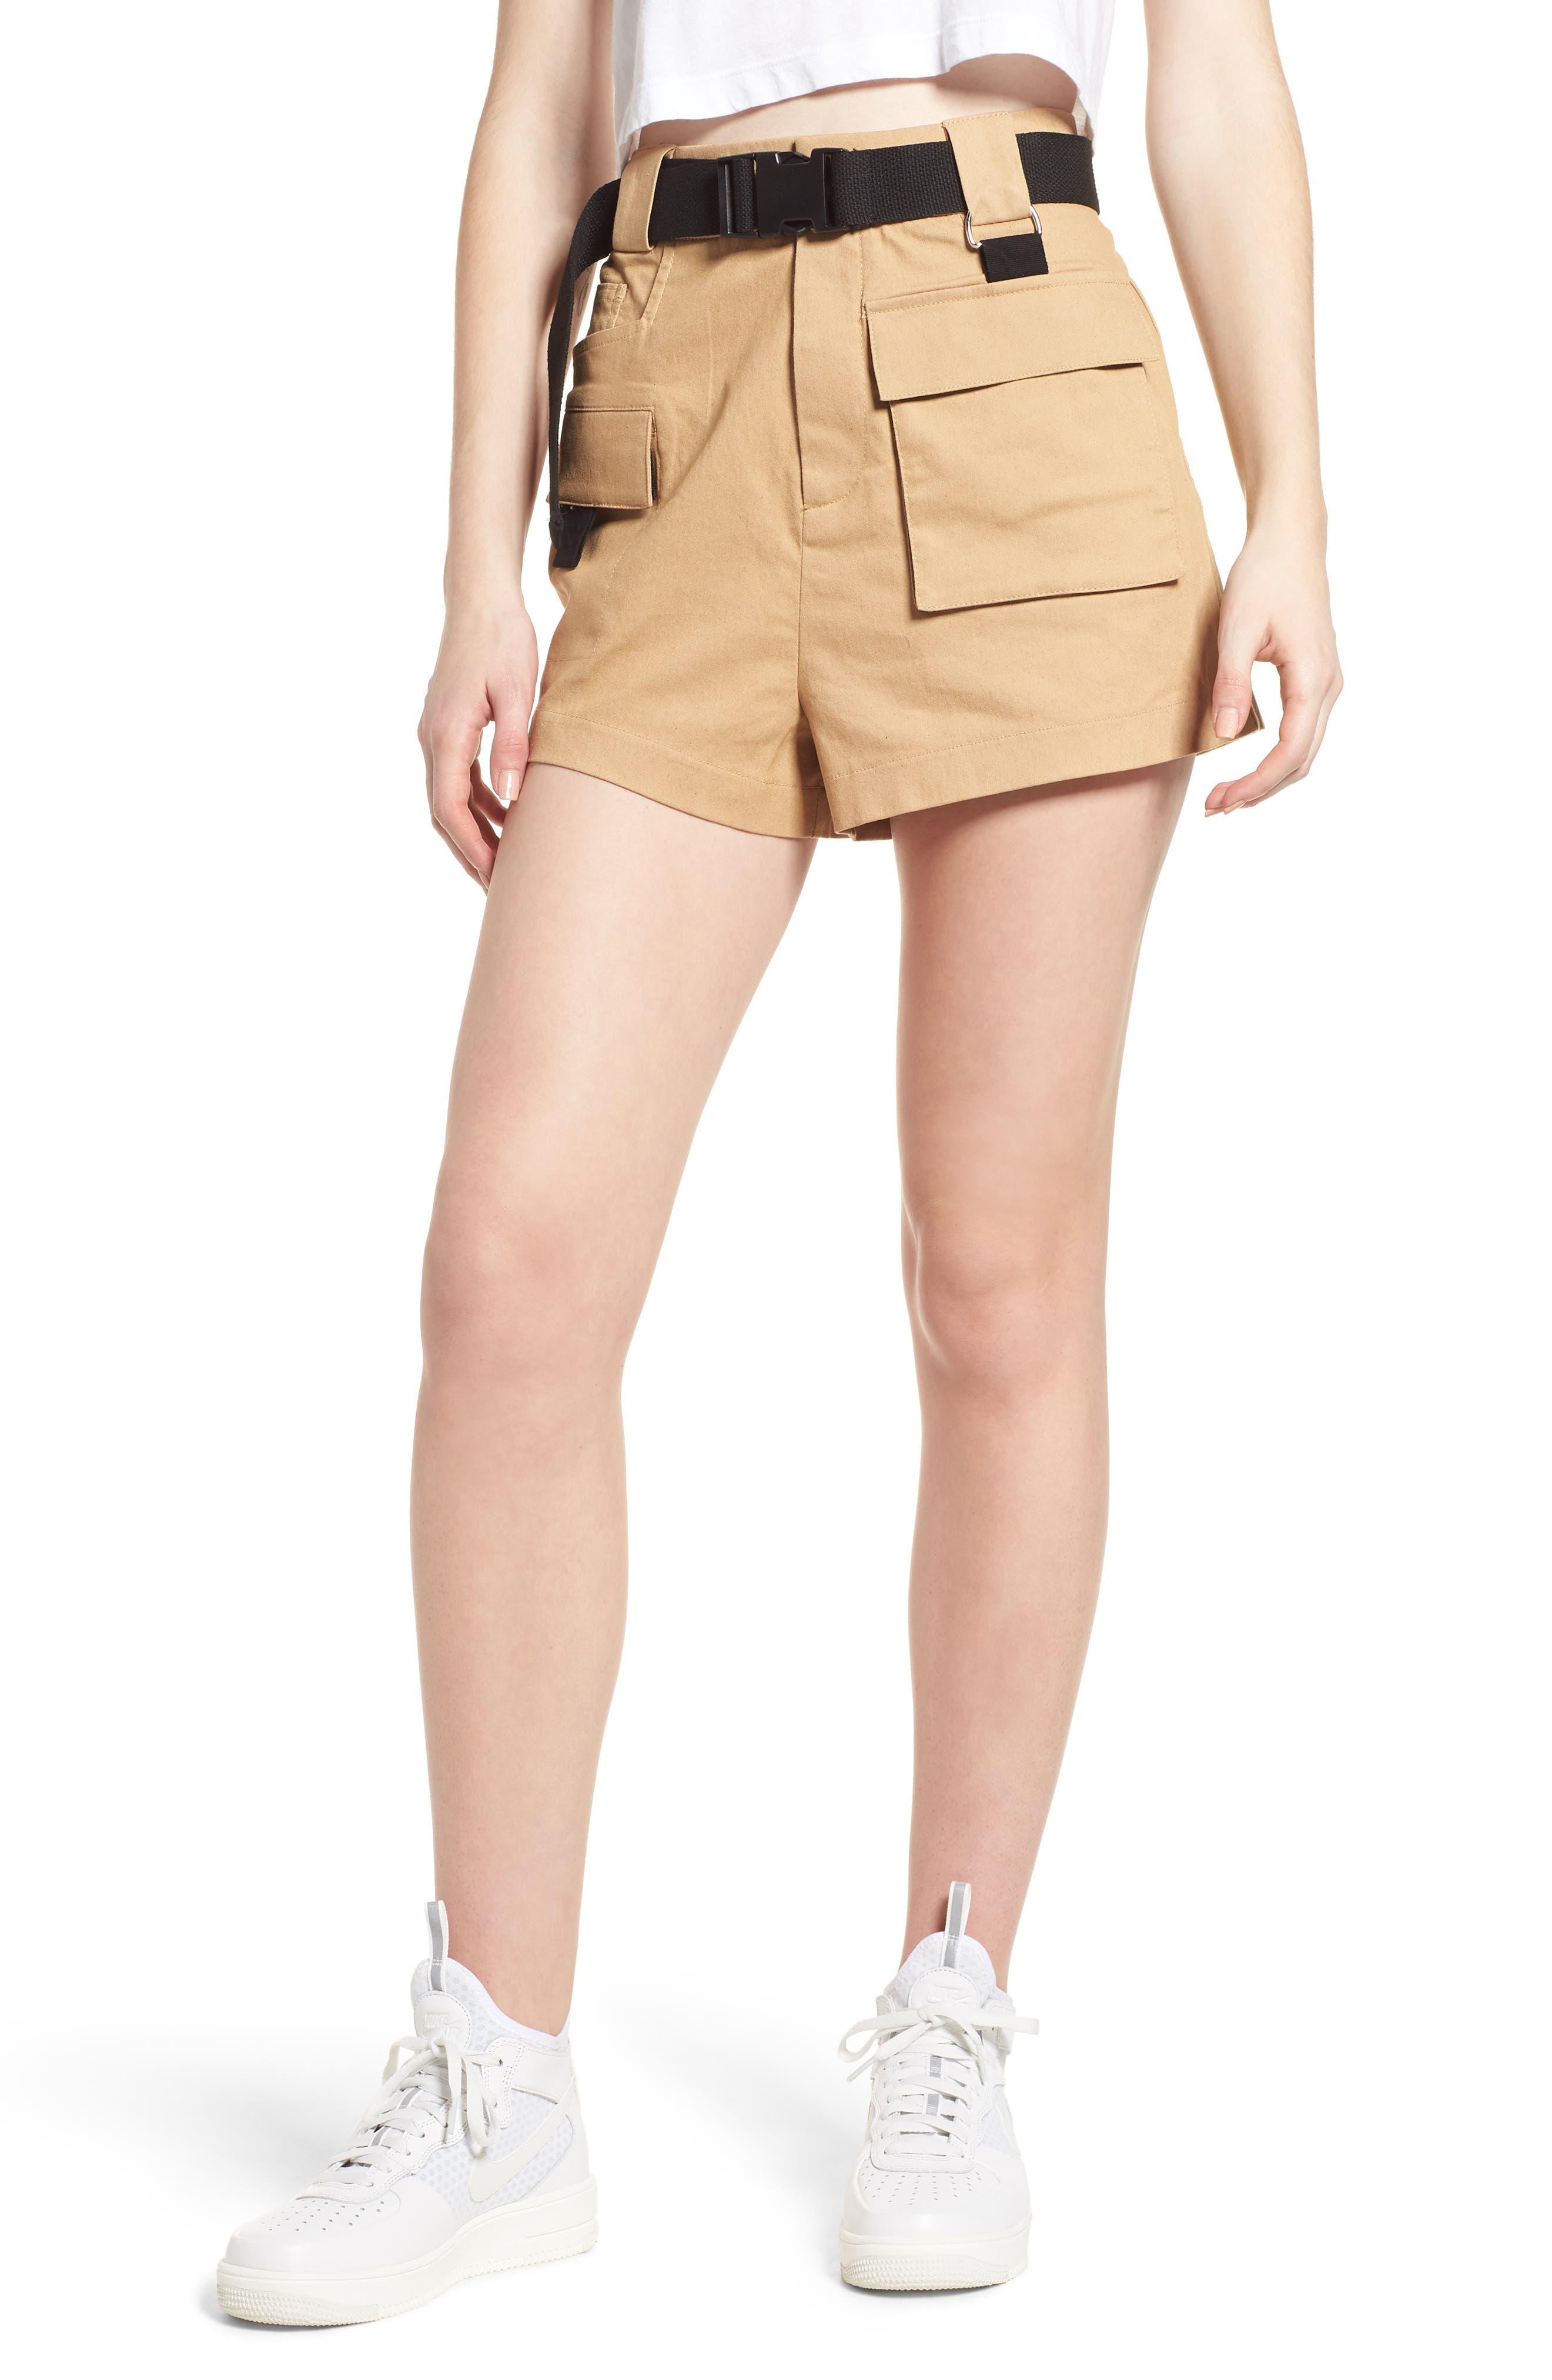 I.AM.GIA I.Am. Gia Harper Shorts in Tan